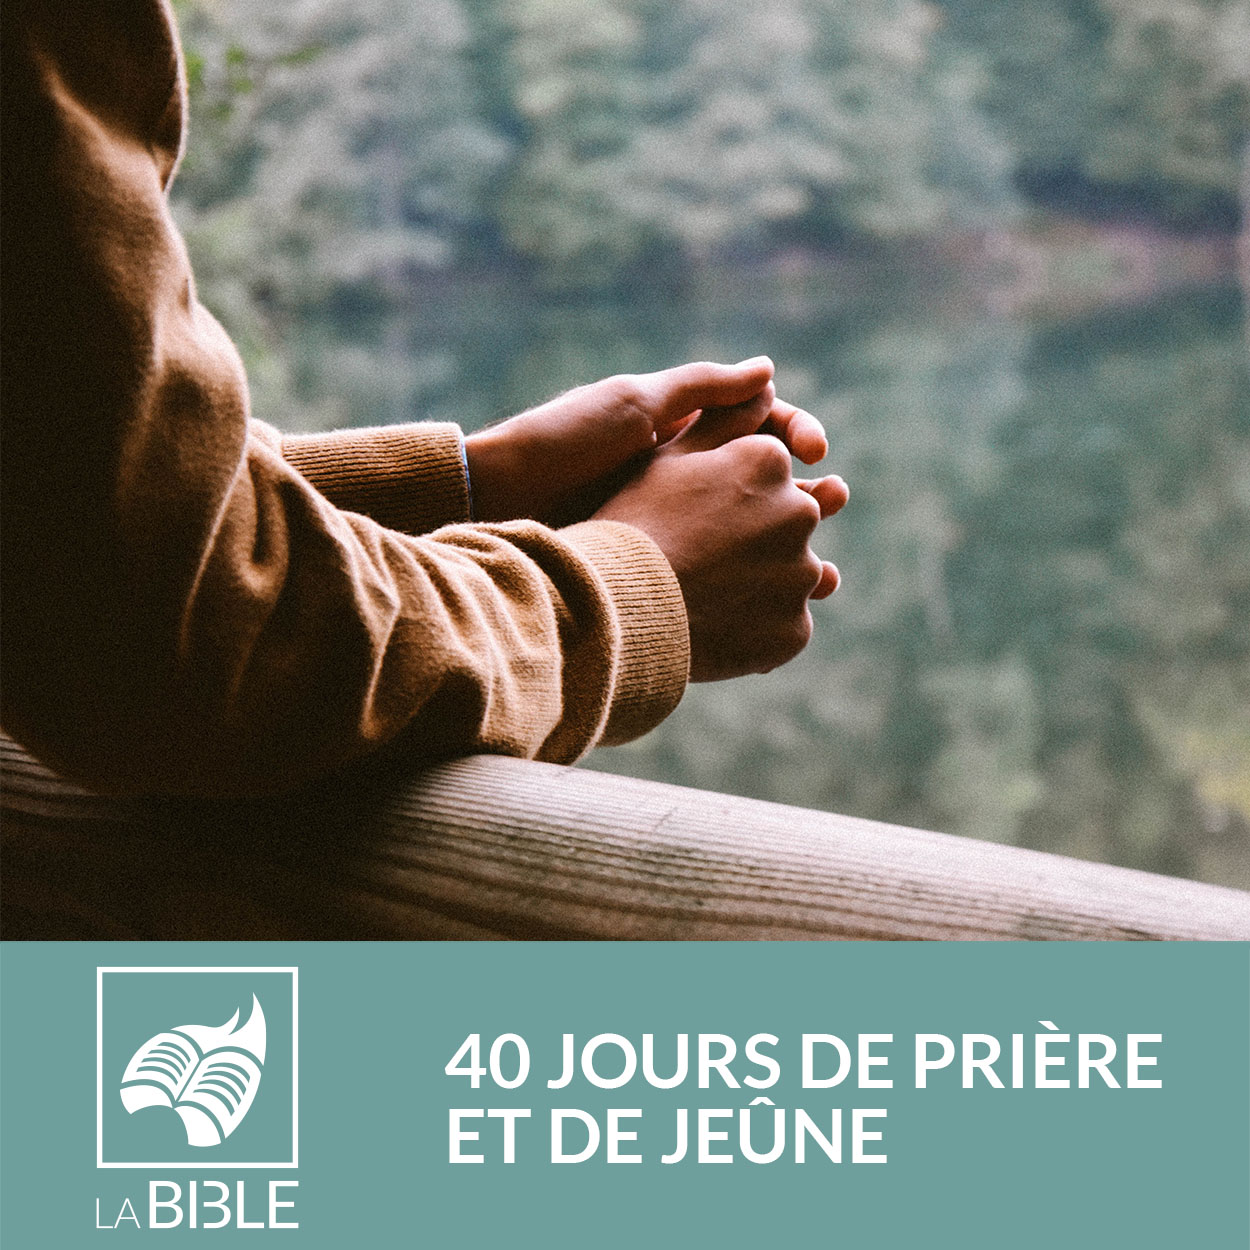 bibledigital40jours.jpg